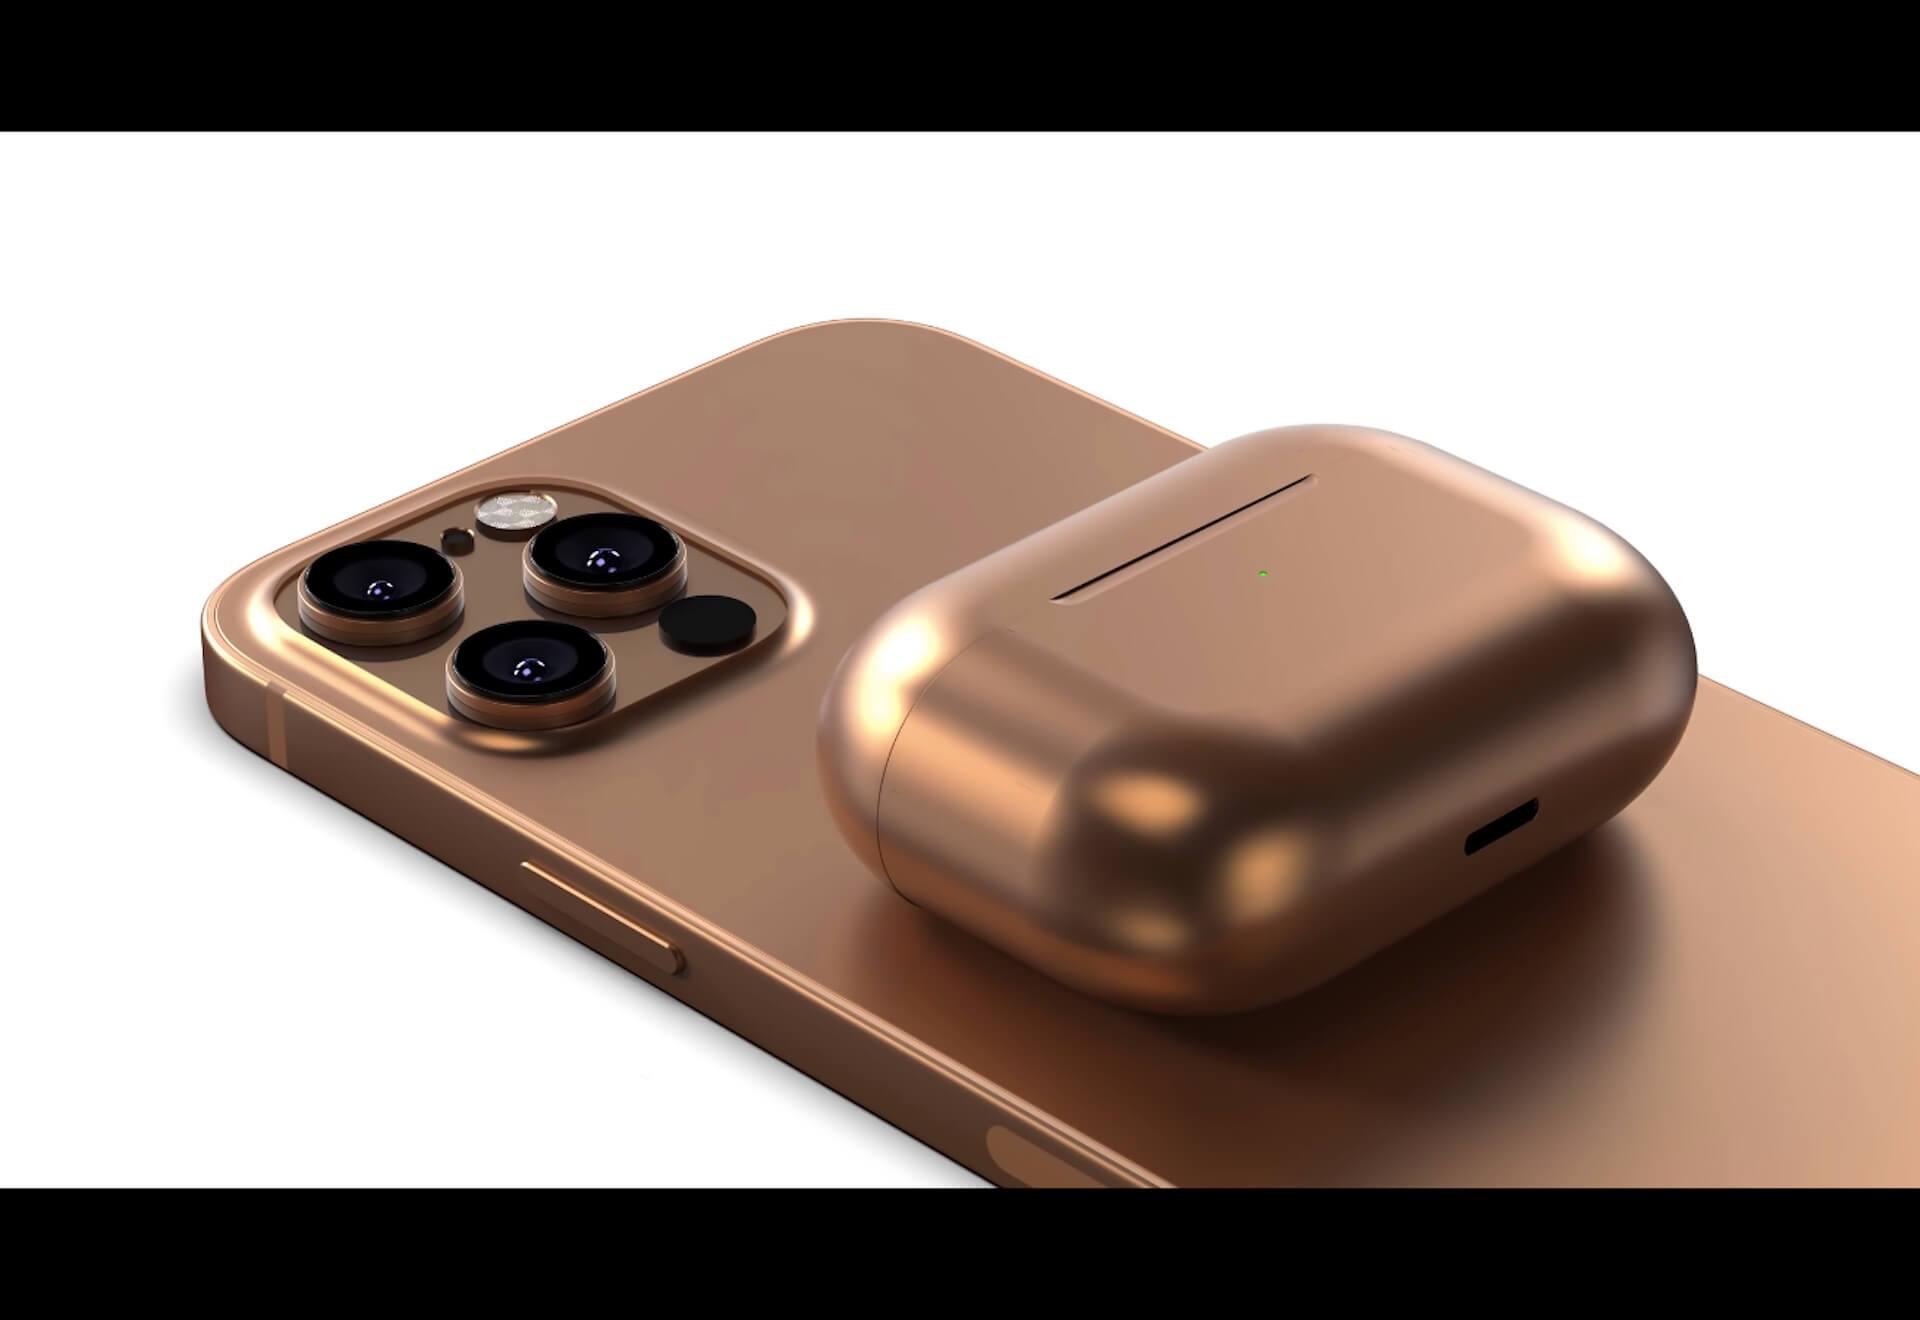 iPhone 12シリーズはAirPods Proのバッテリー技術を応用し、バッテリー寿命が伸びる? tech200826_iphone12_battery_main